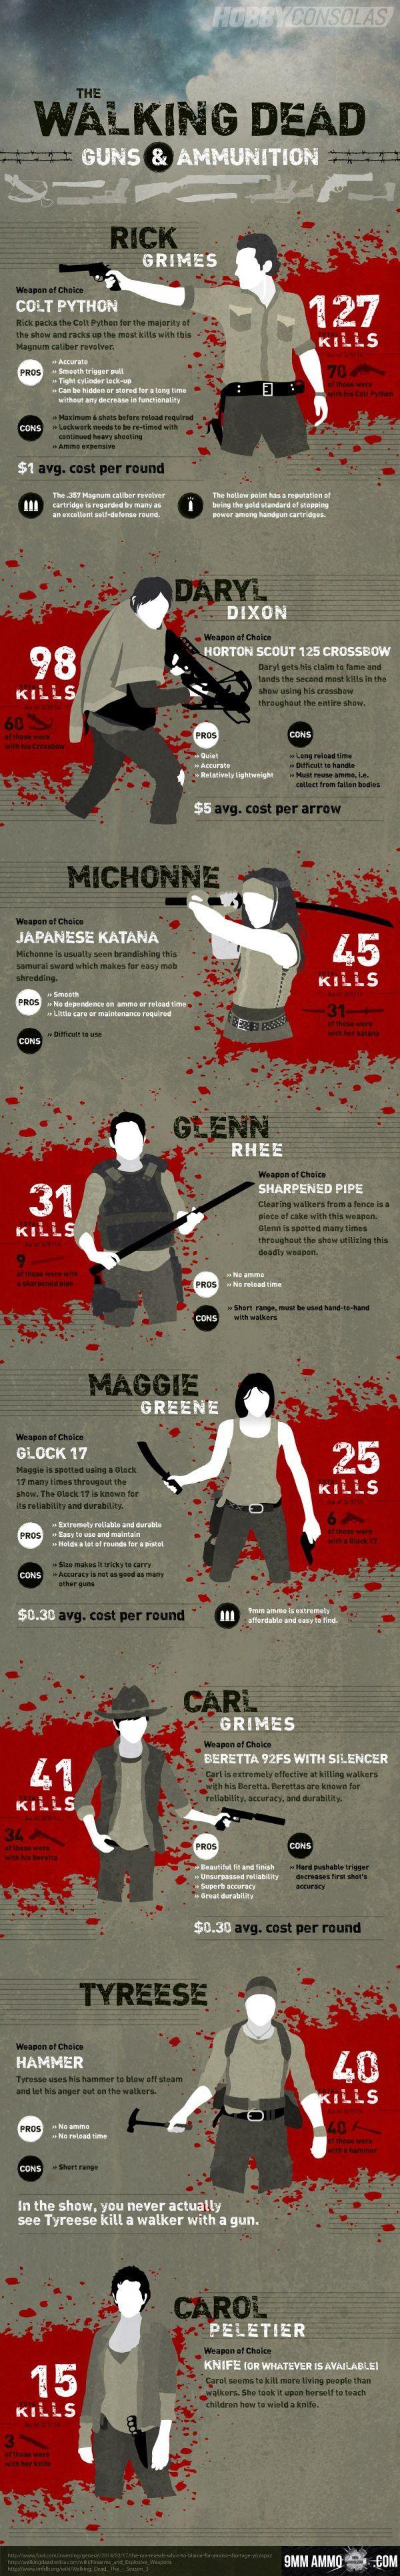 Cuantos zombies mató cada personaje de The Walking Dead.